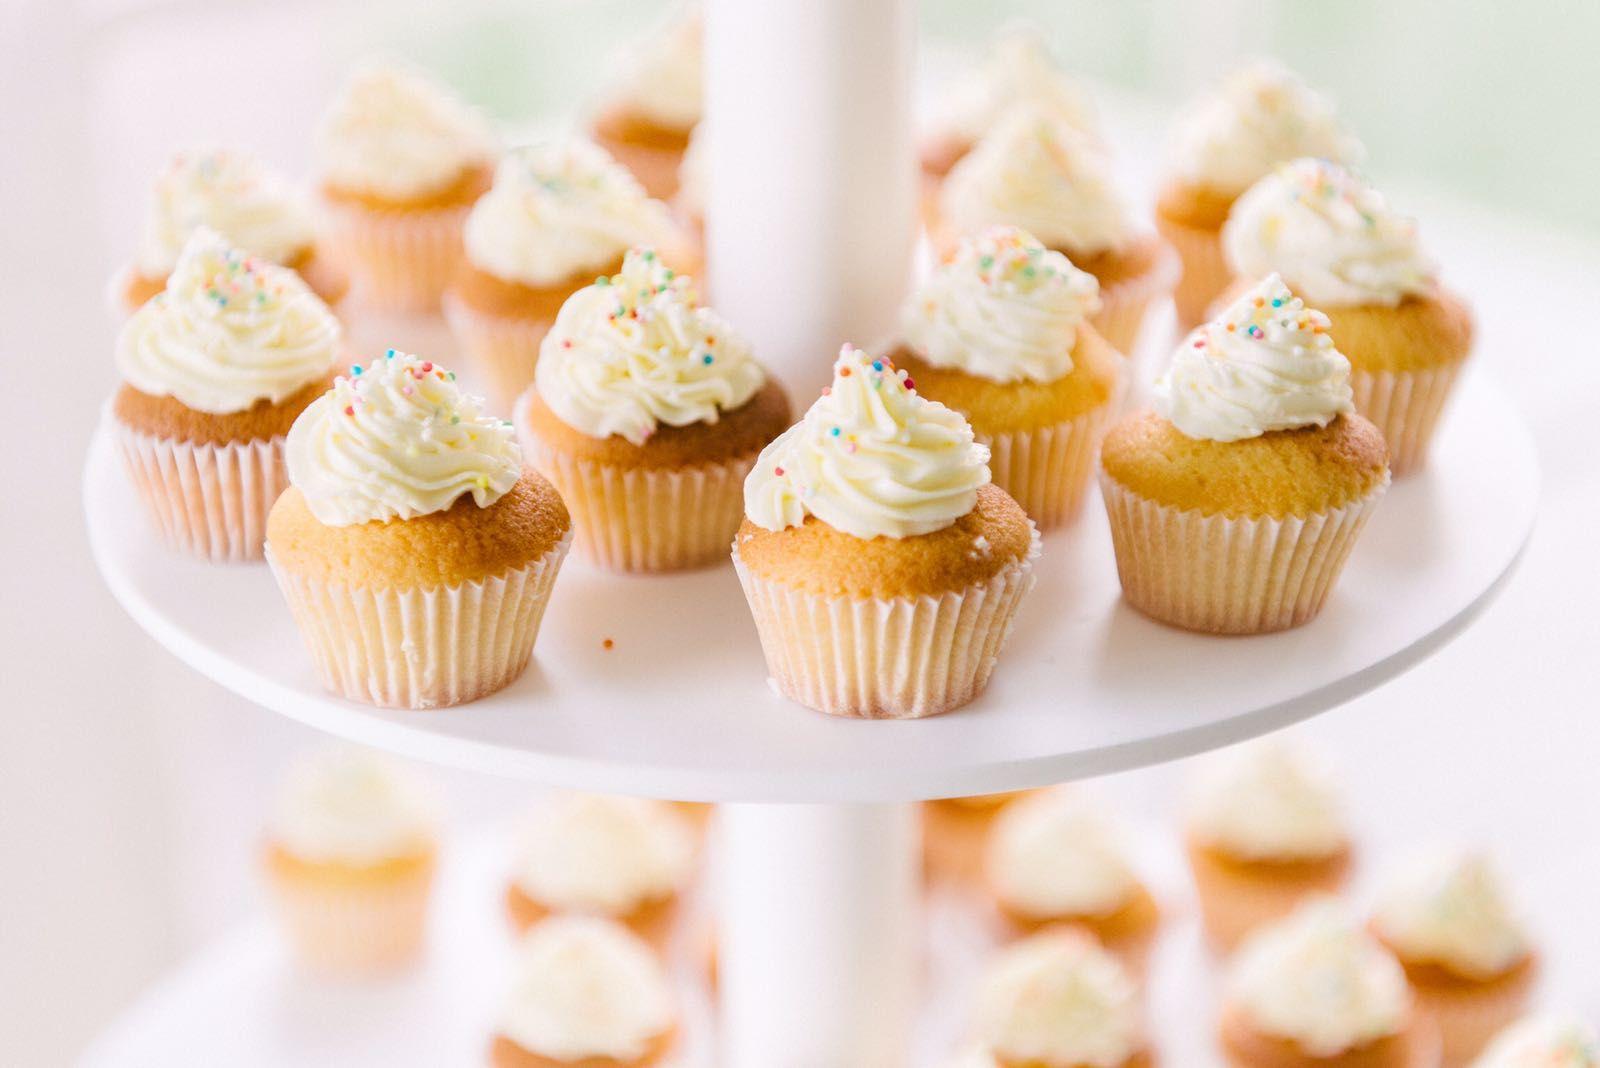 Discodip / sprinkles cupcakes!